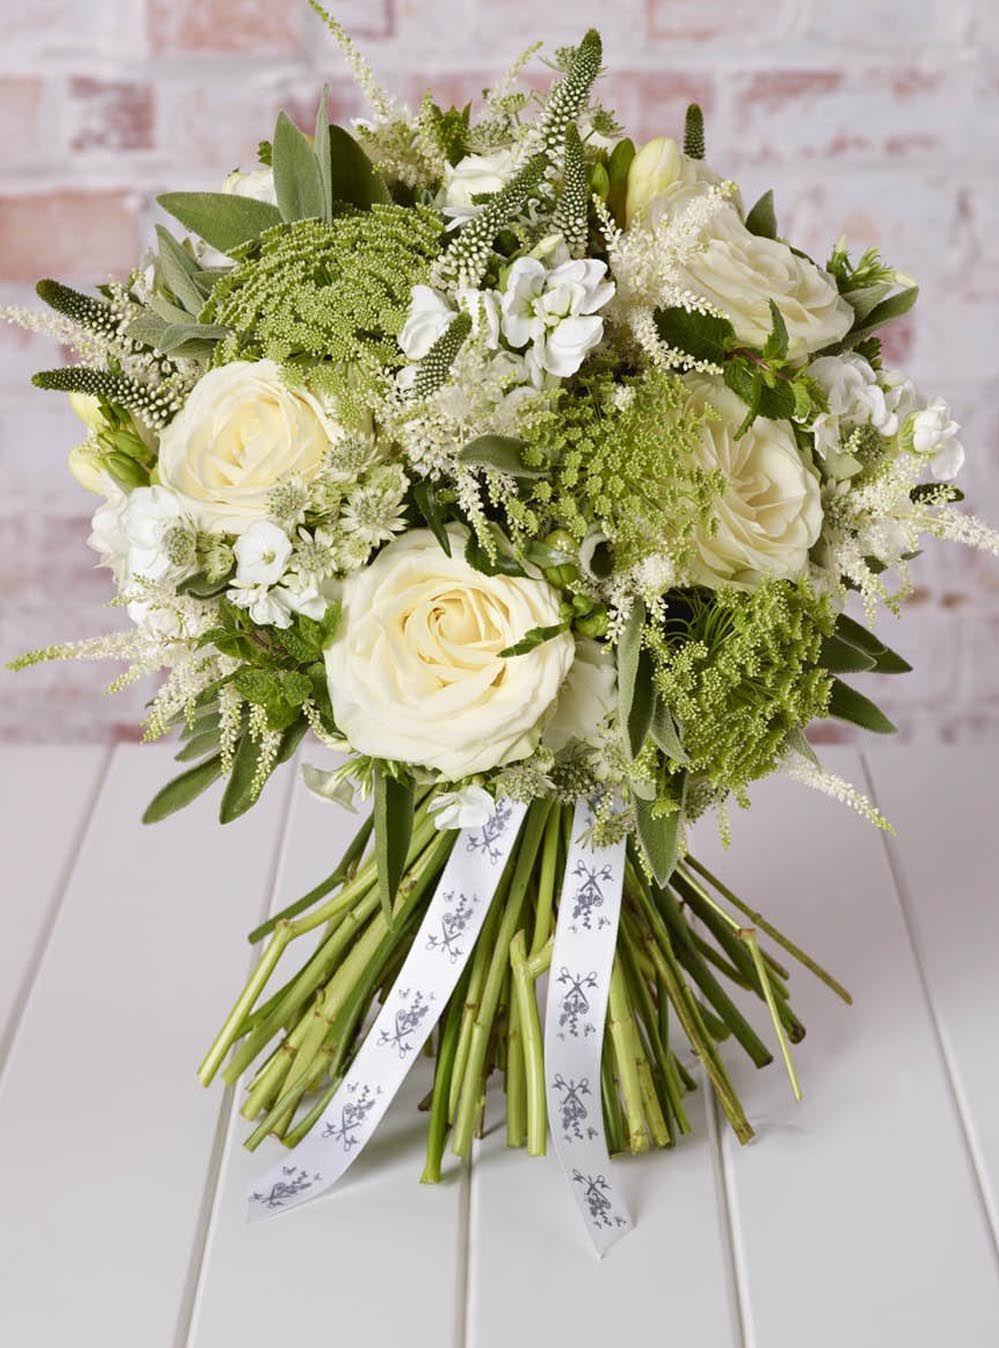 The hampton larry walshe floral design british bouquet pinterest the hampton larry walshe floral design white rose bouquetwhite rosesvalentines dayfloristsdubaifloral designbouquets izmirmasajfo